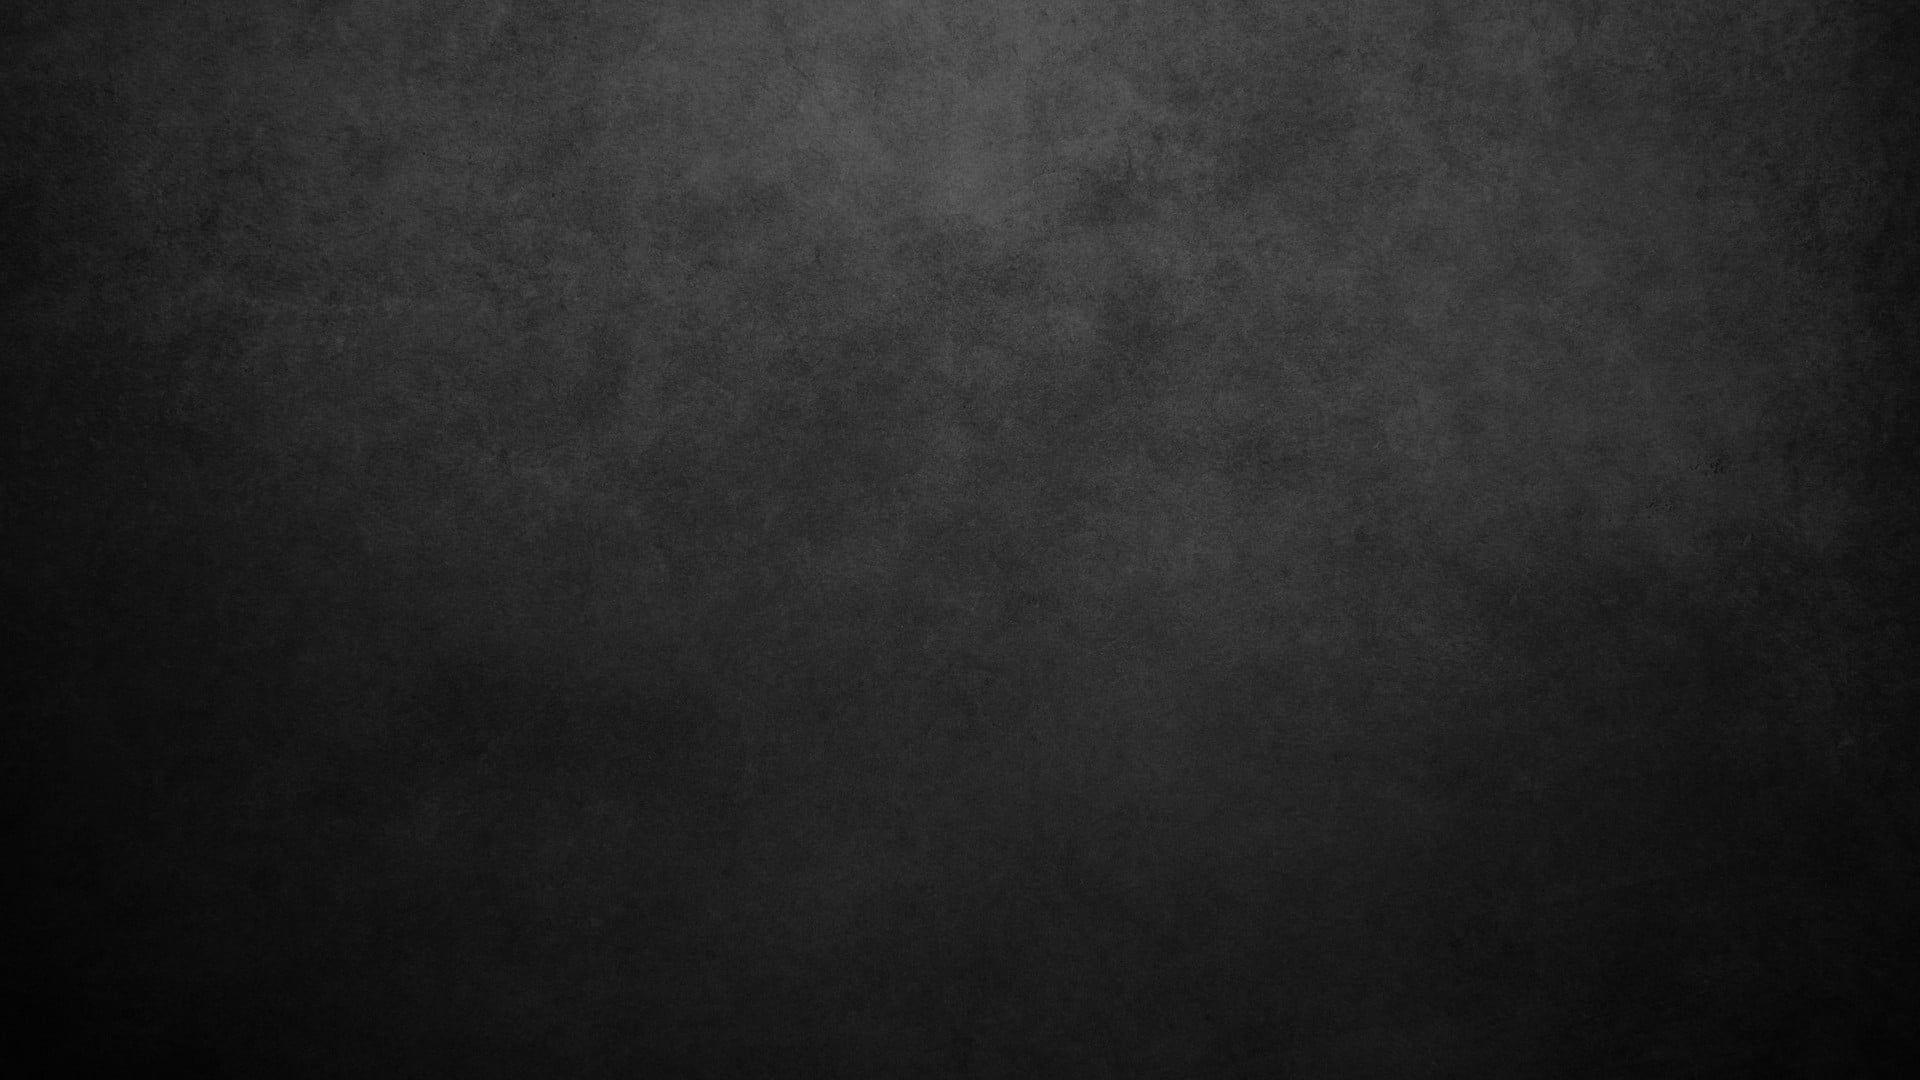 Simple Background 1080p Wallpaper Hdwallpaper Desktop